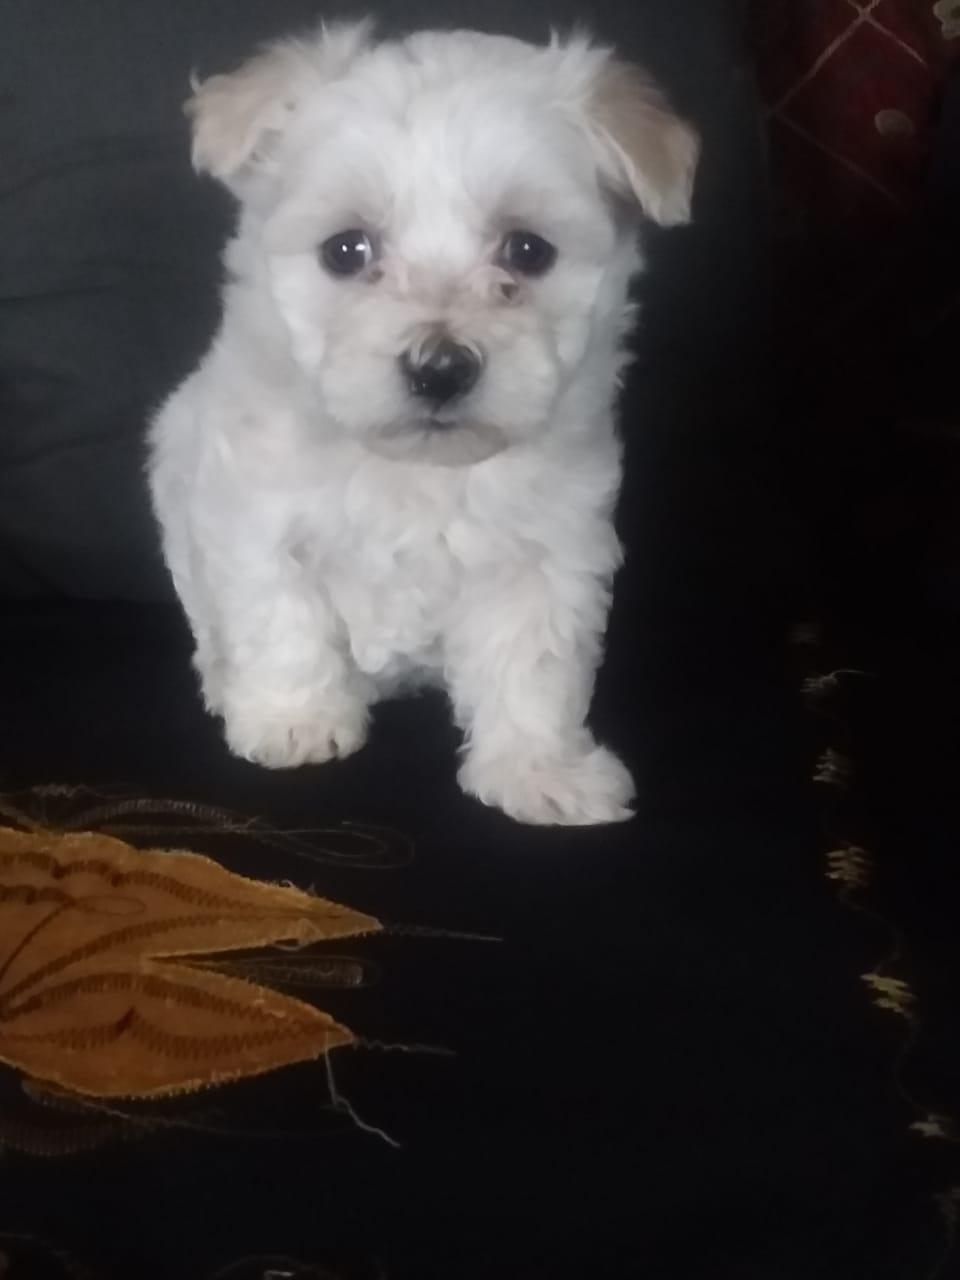 teacup maltese poodle female puppy